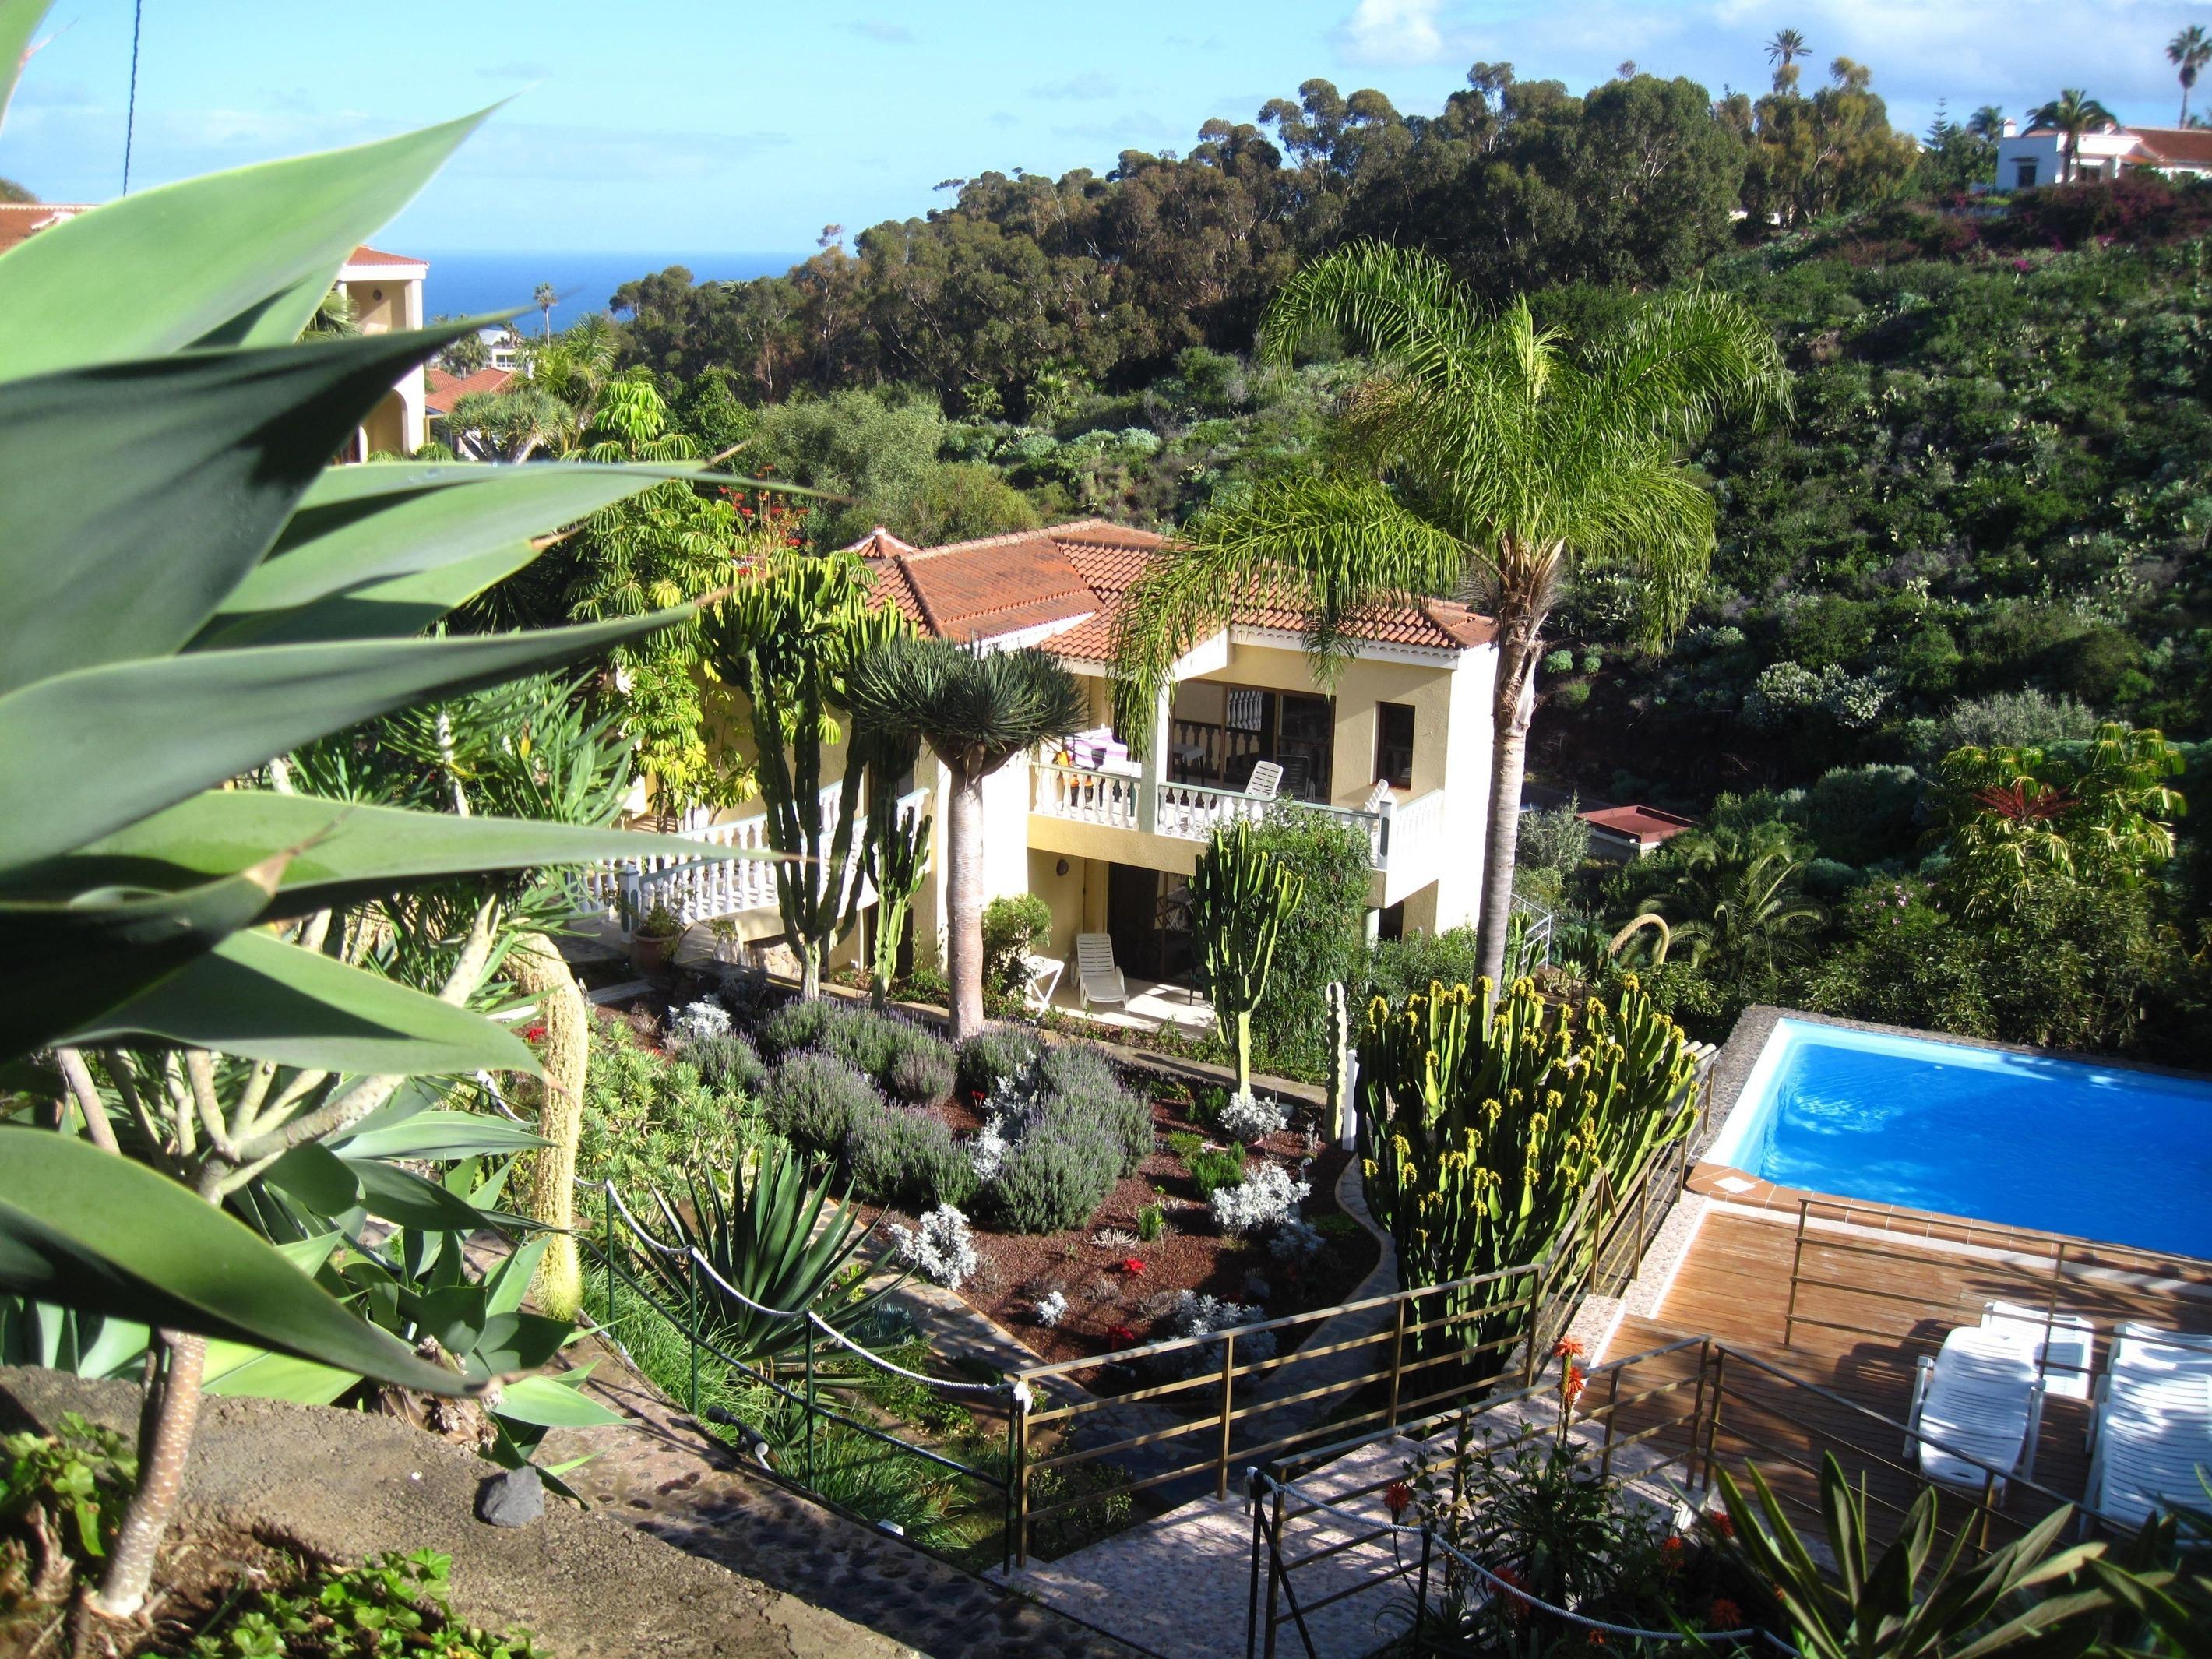 Appartement de vacances Fewo Atico Florasol, sehr ruhig direkt am Naturschutzgebiet, mit Pool, 2 Terrassen, Grill, (2492983), Santa Ursula, Ténérife, Iles Canaries, Espagne, image 17